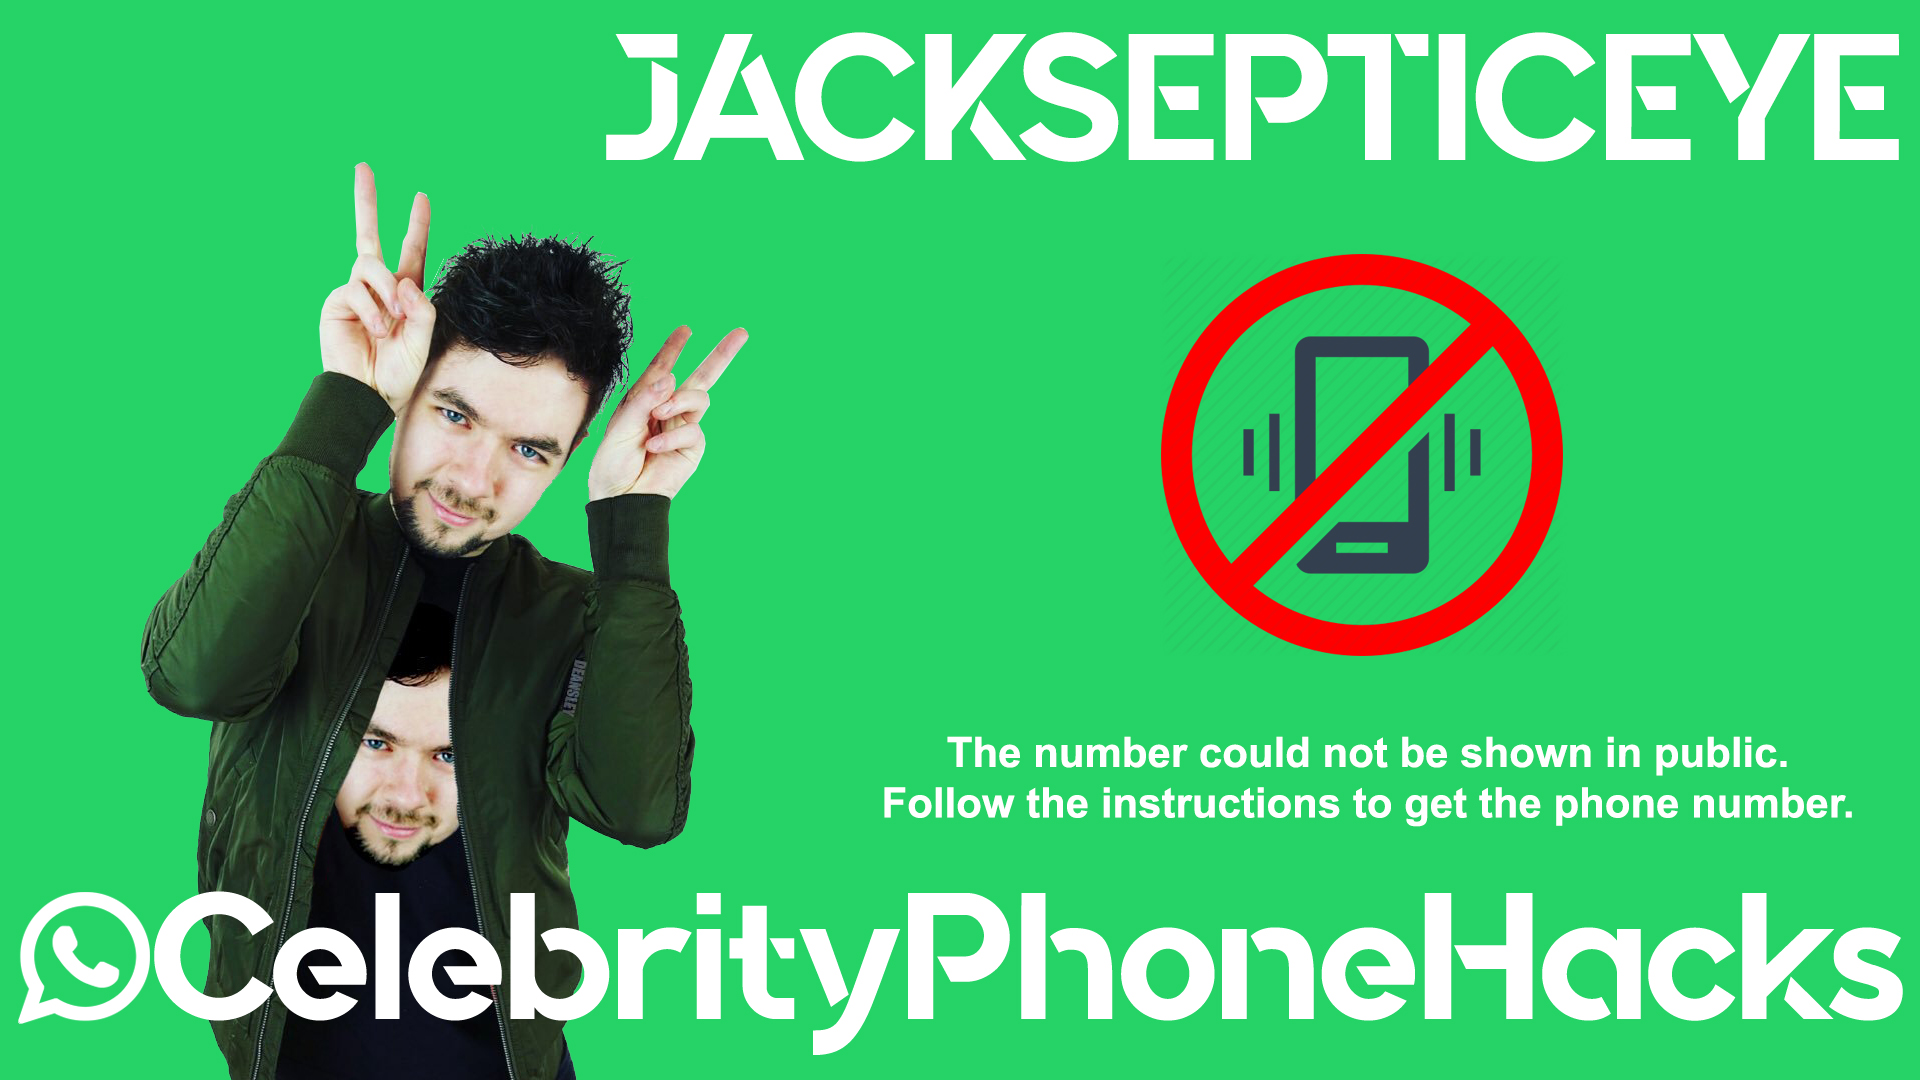 JackSepticEye real phone number 2019 whatsapp hacked leaked